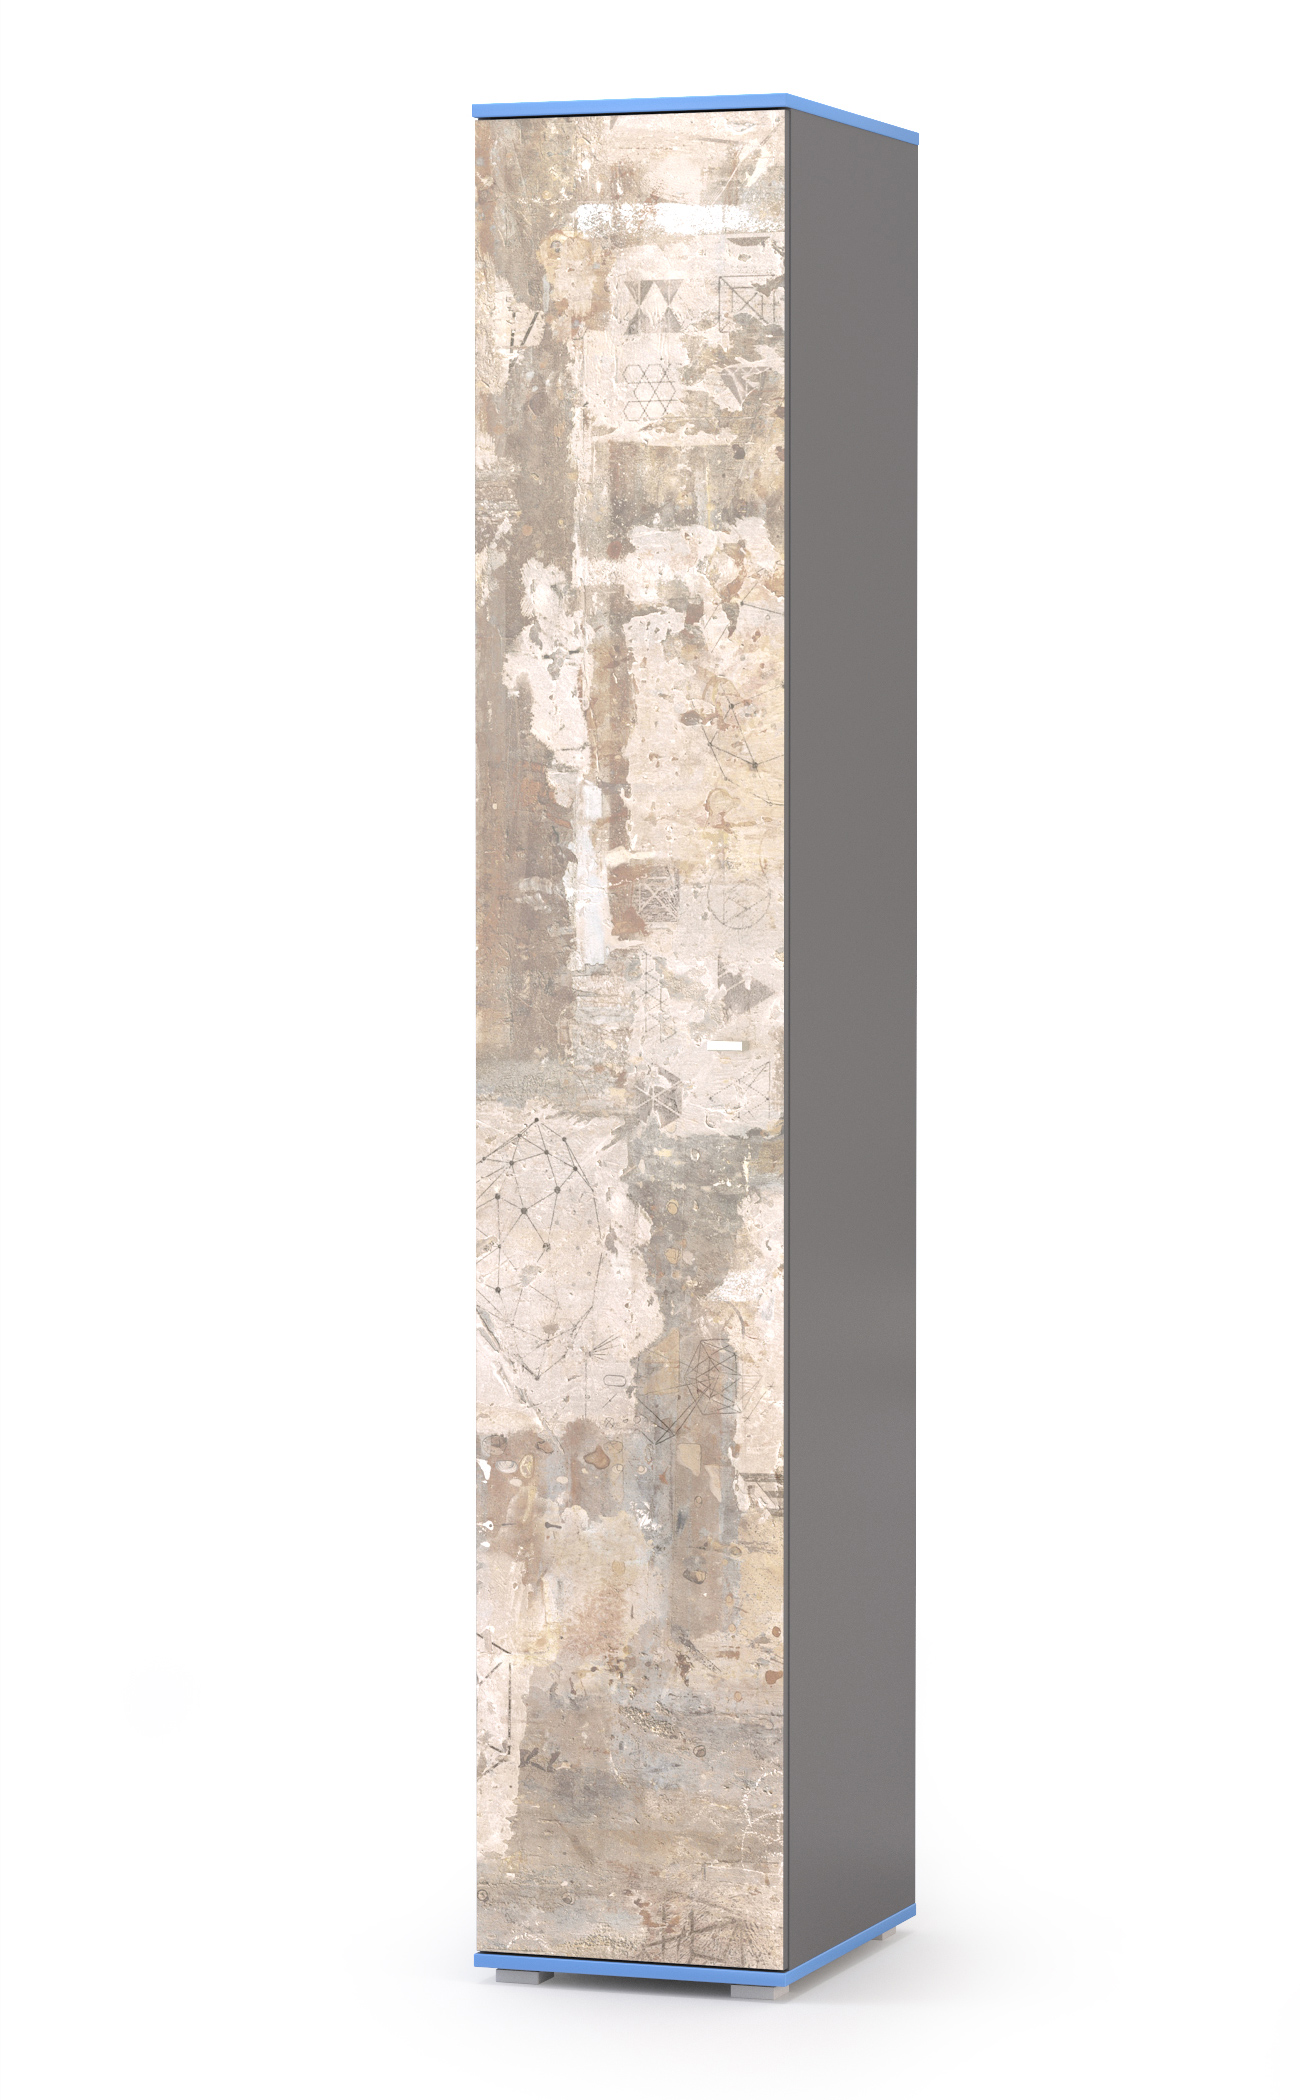 Пенал Mobi Индиго 13.41 тёмно серый/граффити, 38,6х51,1х219,6